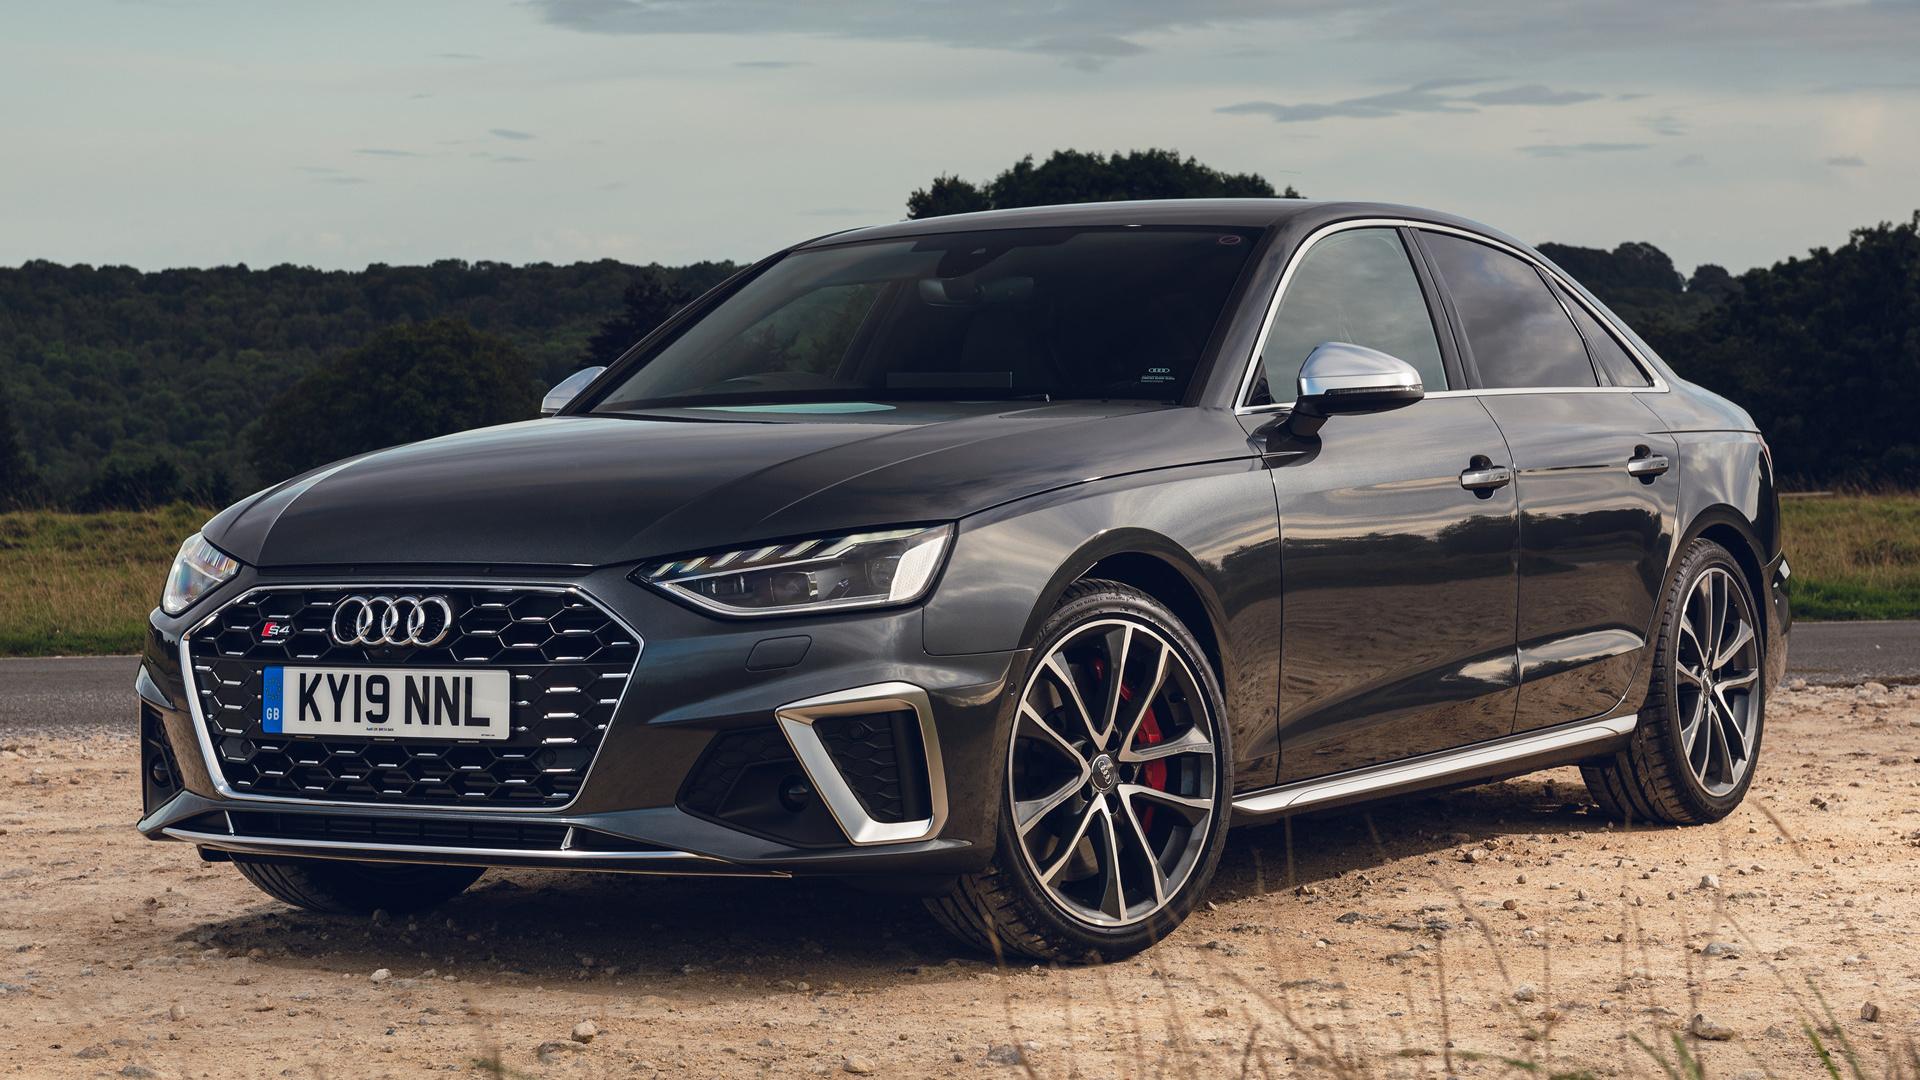 Kelebihan Audi S4 2019 Tangguh